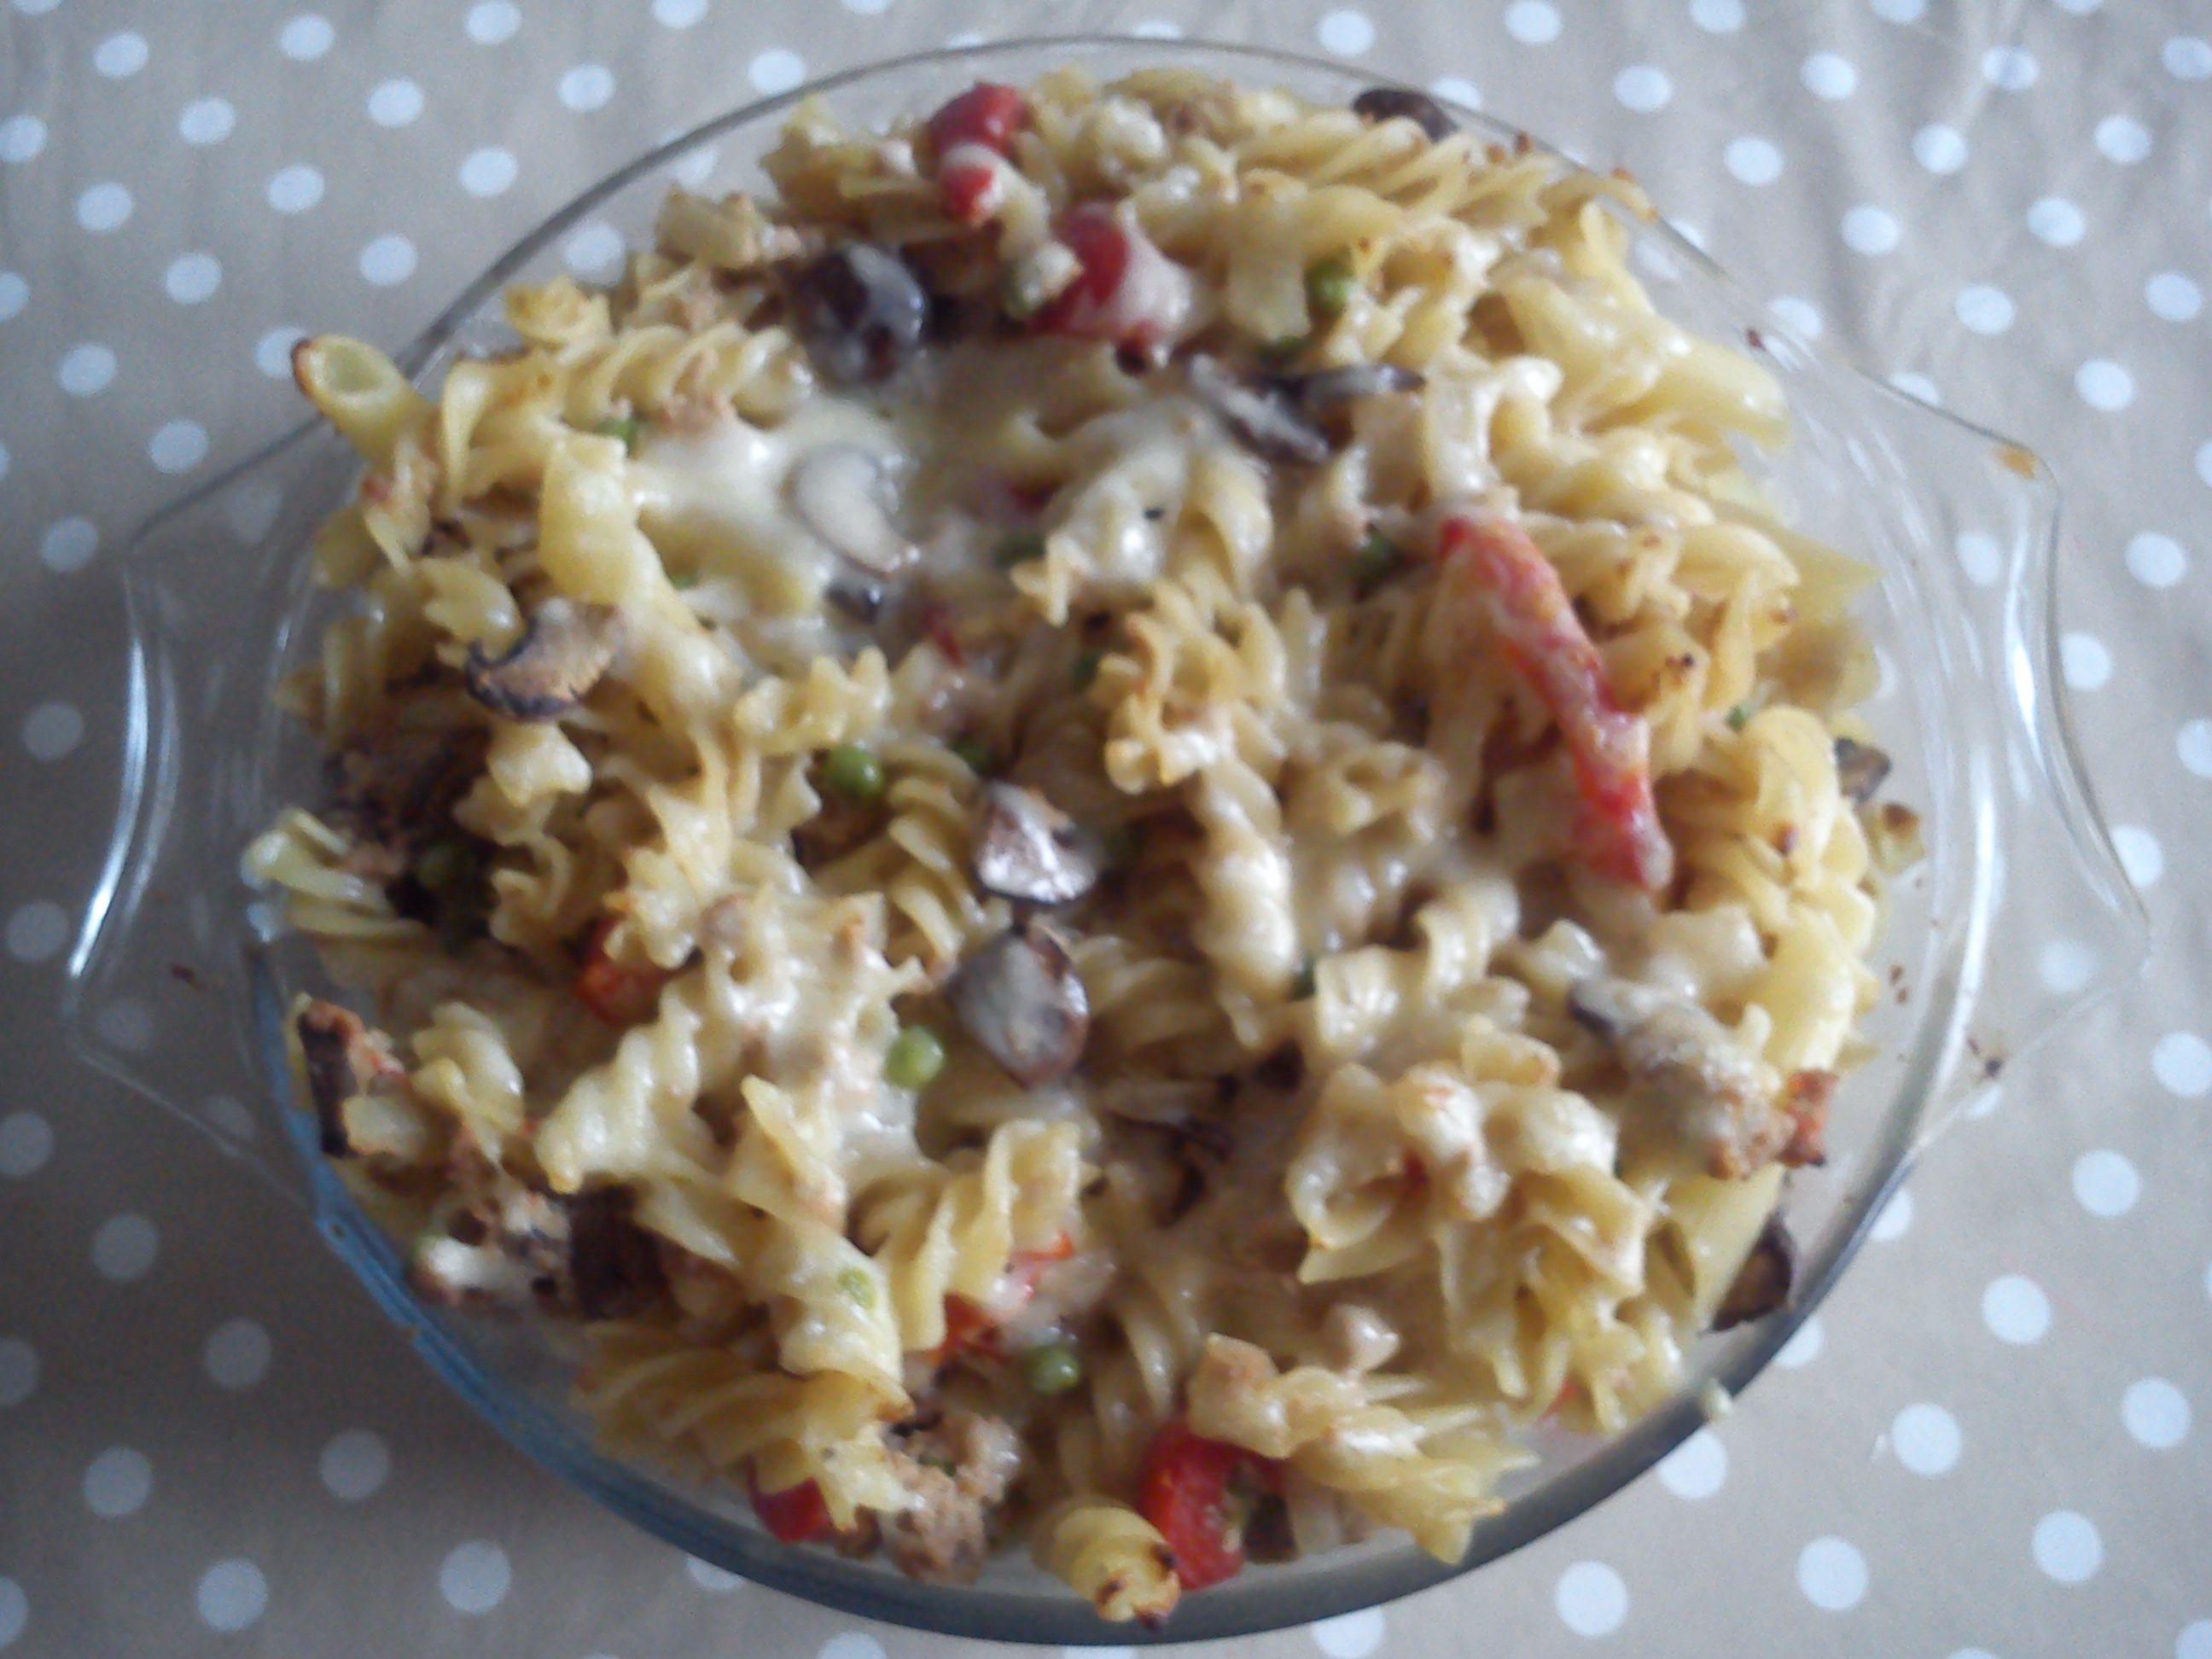 Tuna Noodle Casserole with Mushrooms